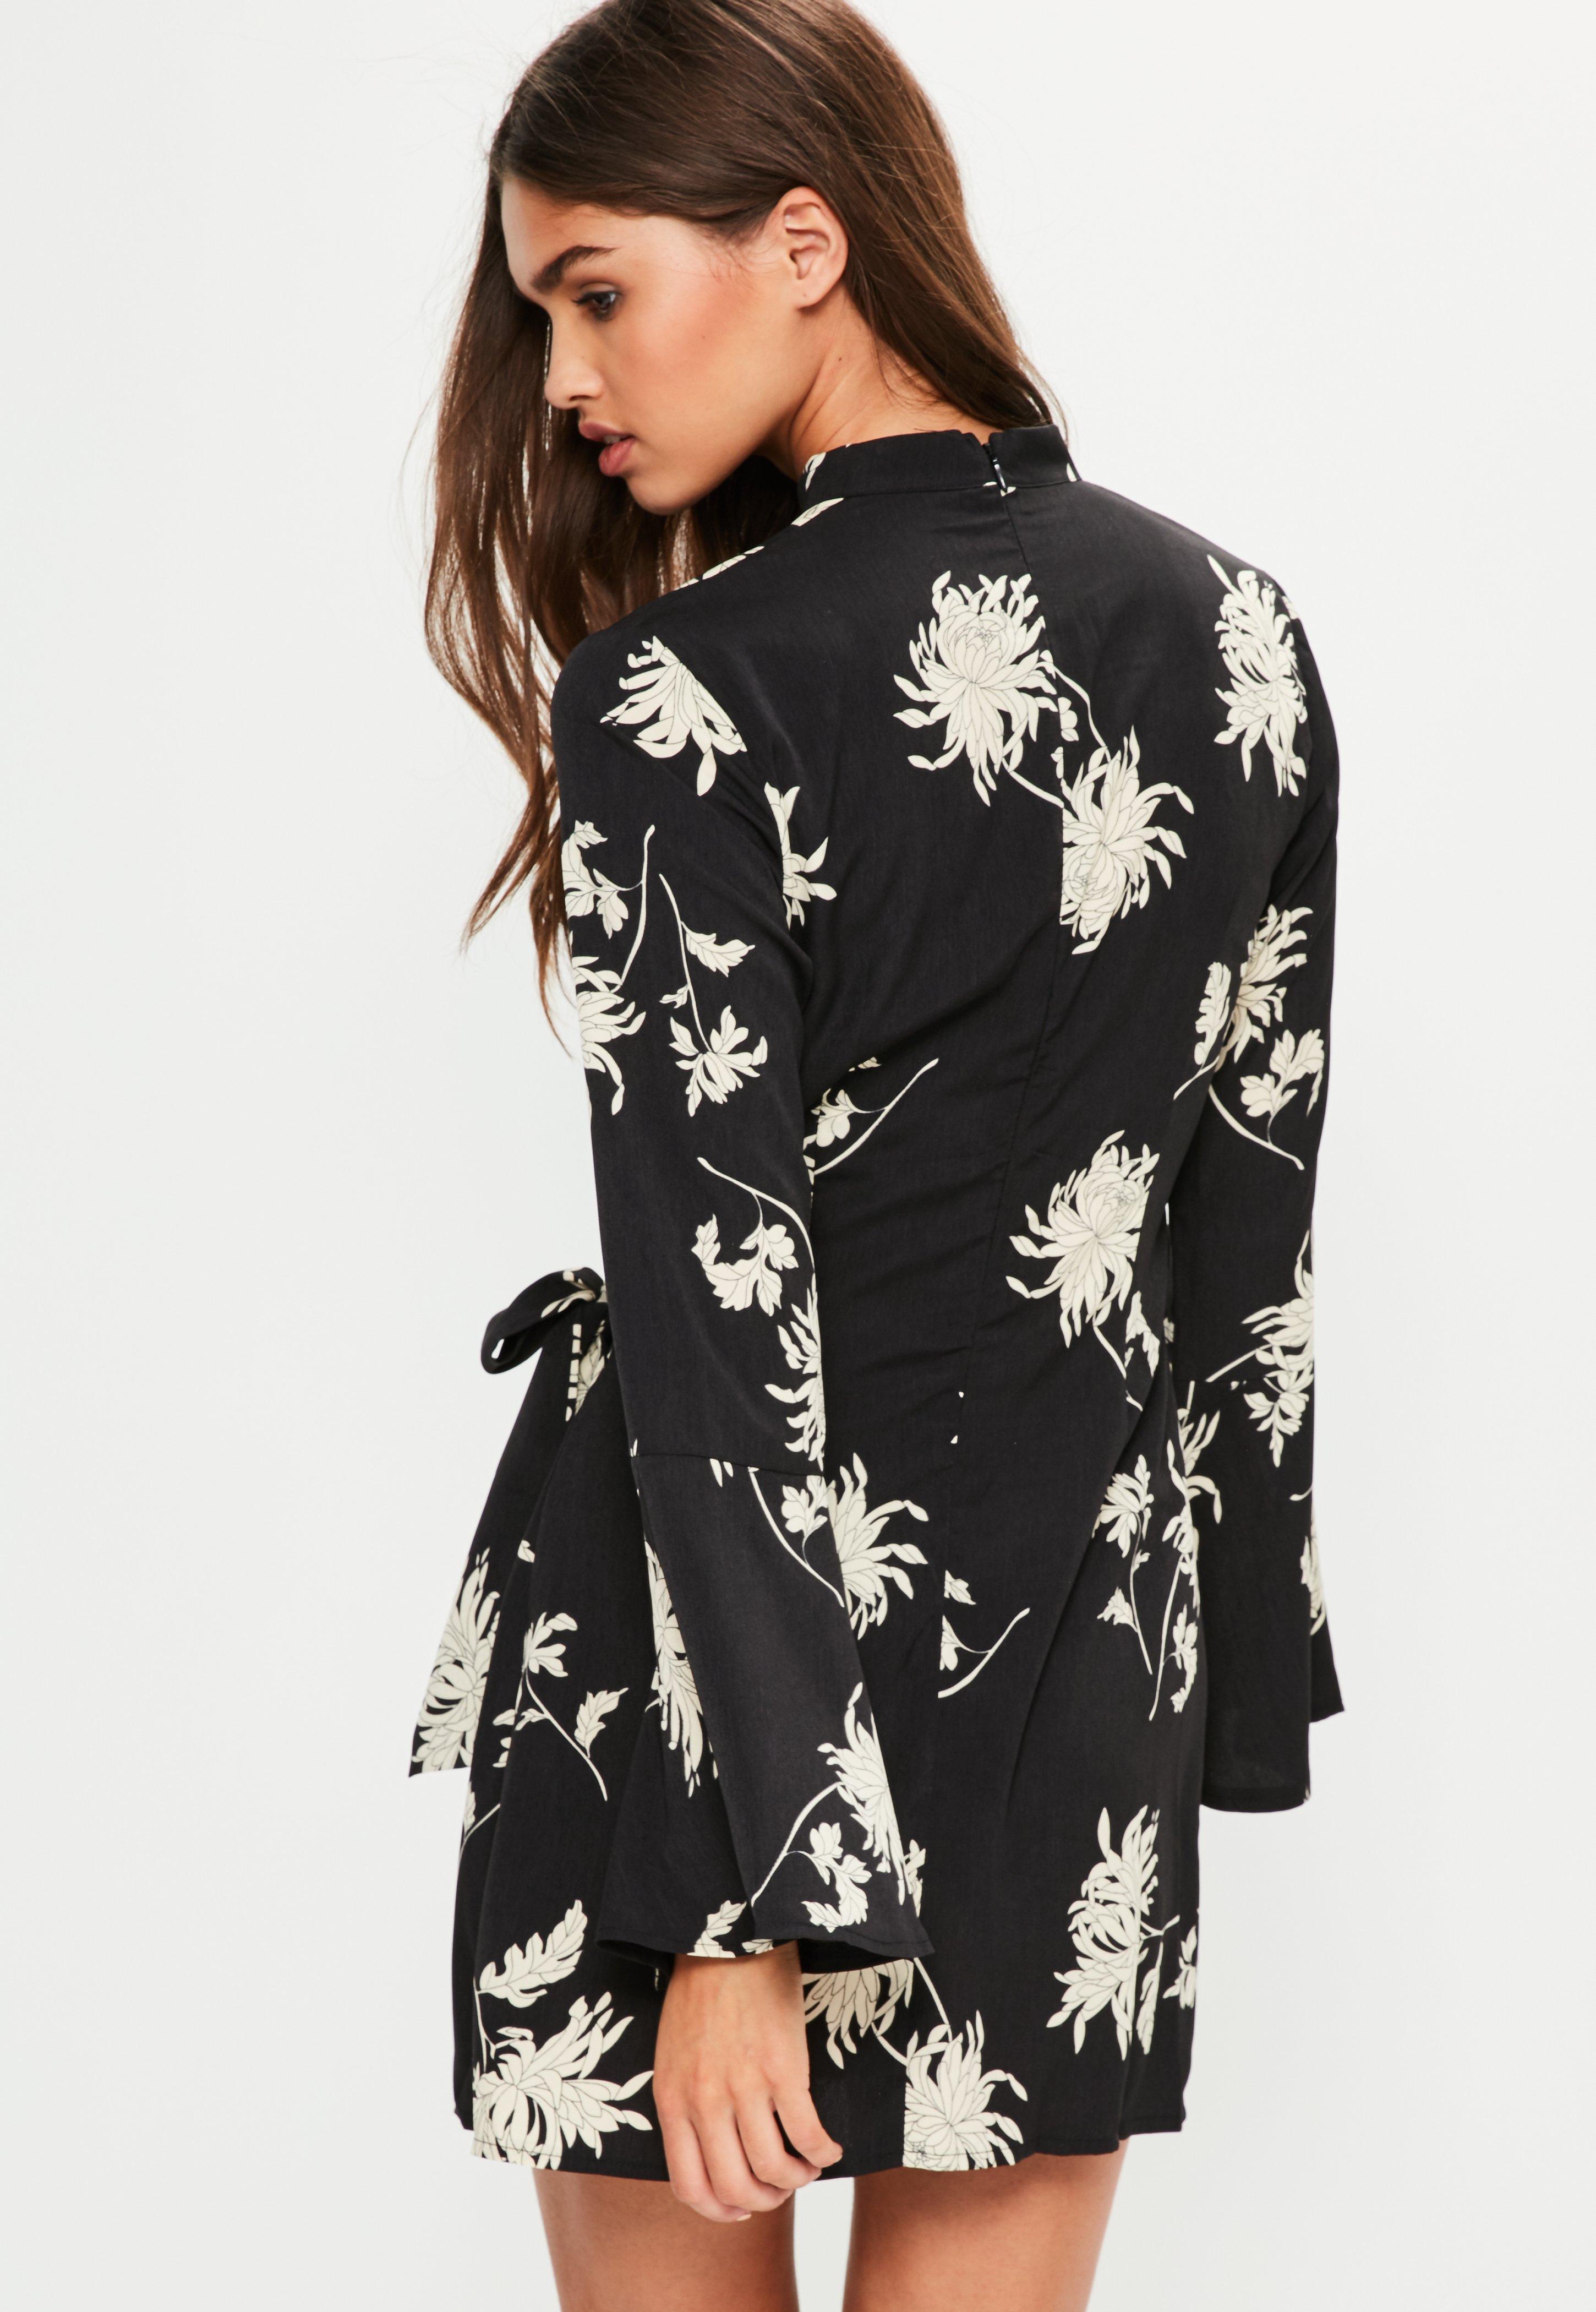 Black Floral Choker Neck Tie Side Dress